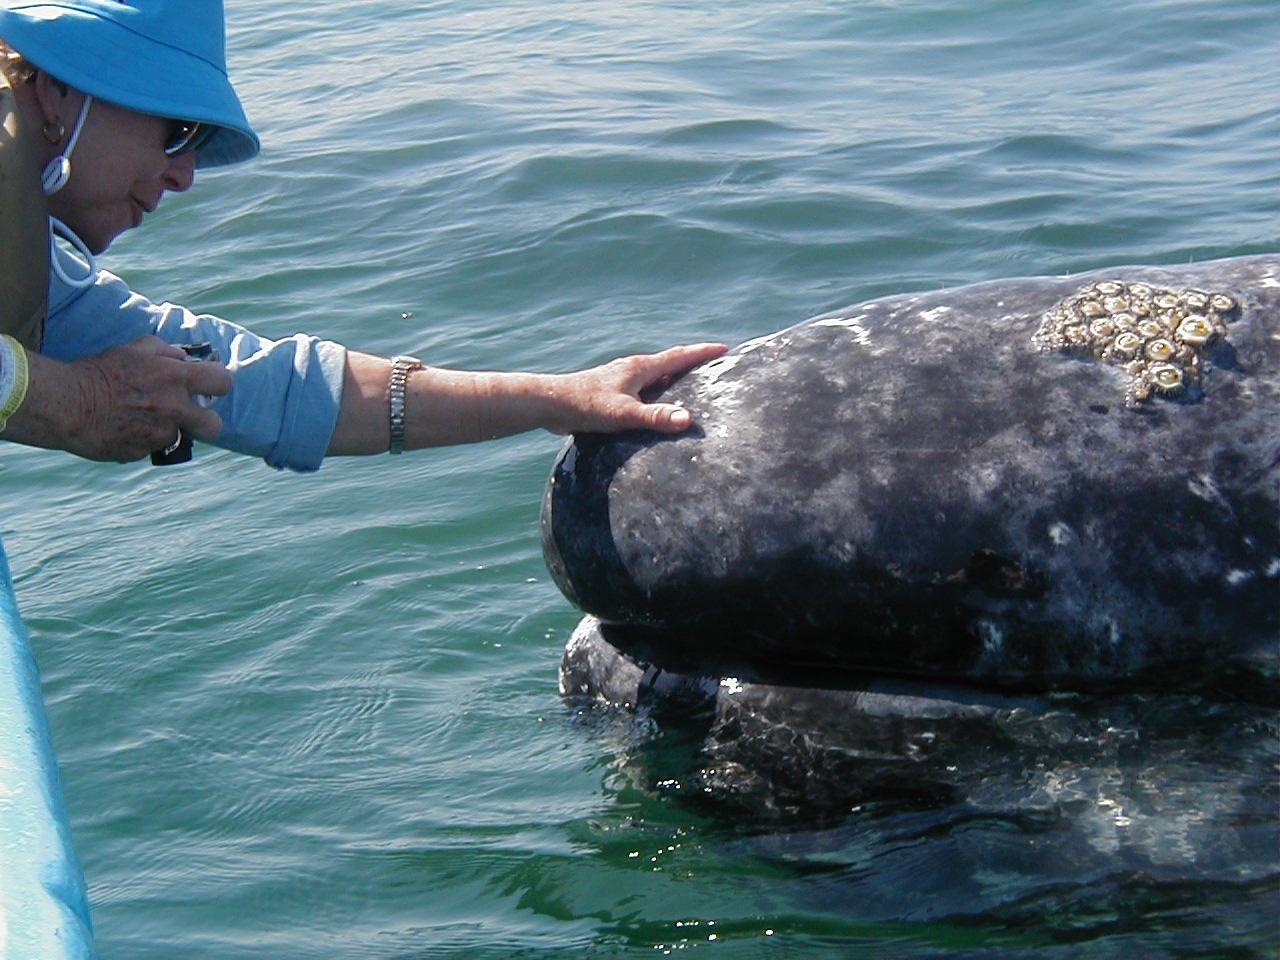 san ignacio lagoon baja california sur to pet the friendly grey